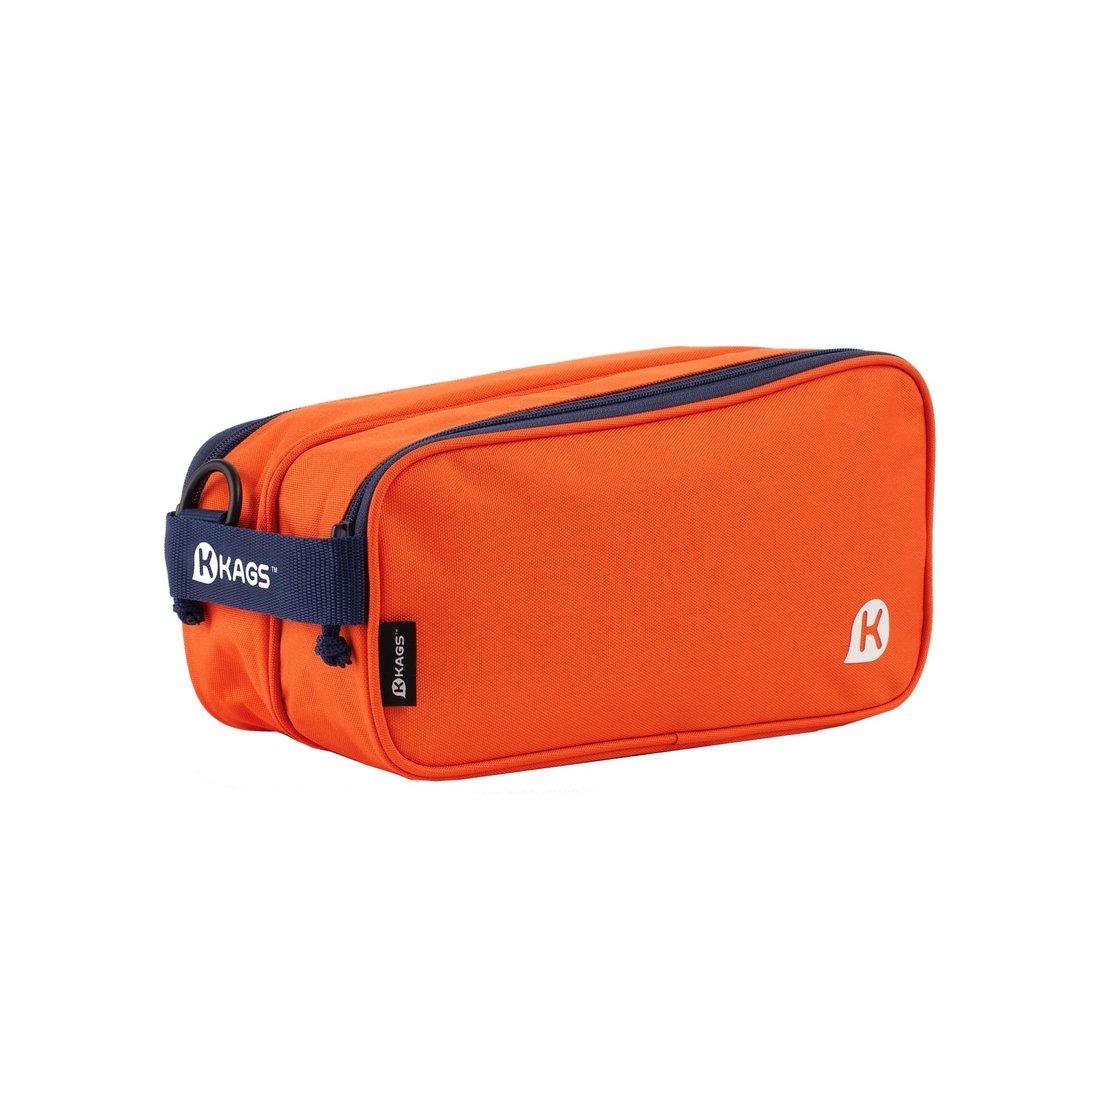 KAGS BRETT 系列超輕便雙分隔內裱膠鞋袋連揹帶 - 橙色